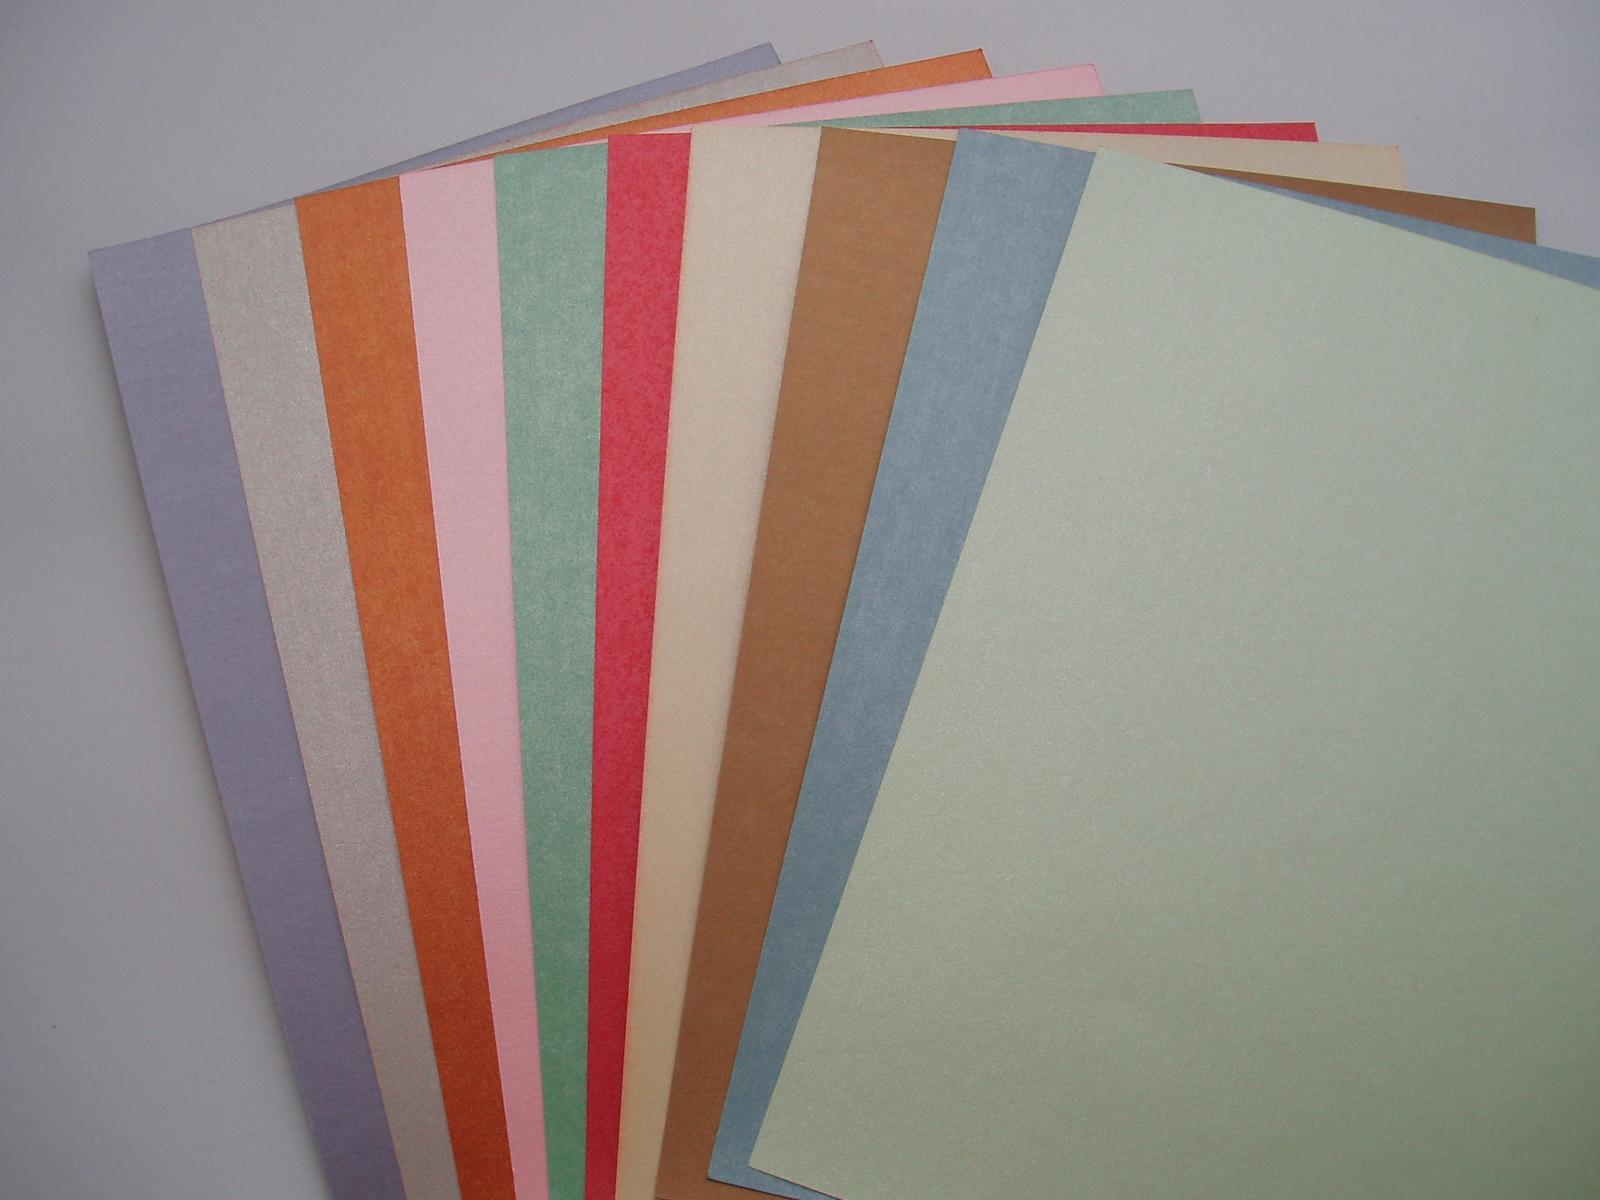 perleťový karton A 4 - Obrázek č. 1